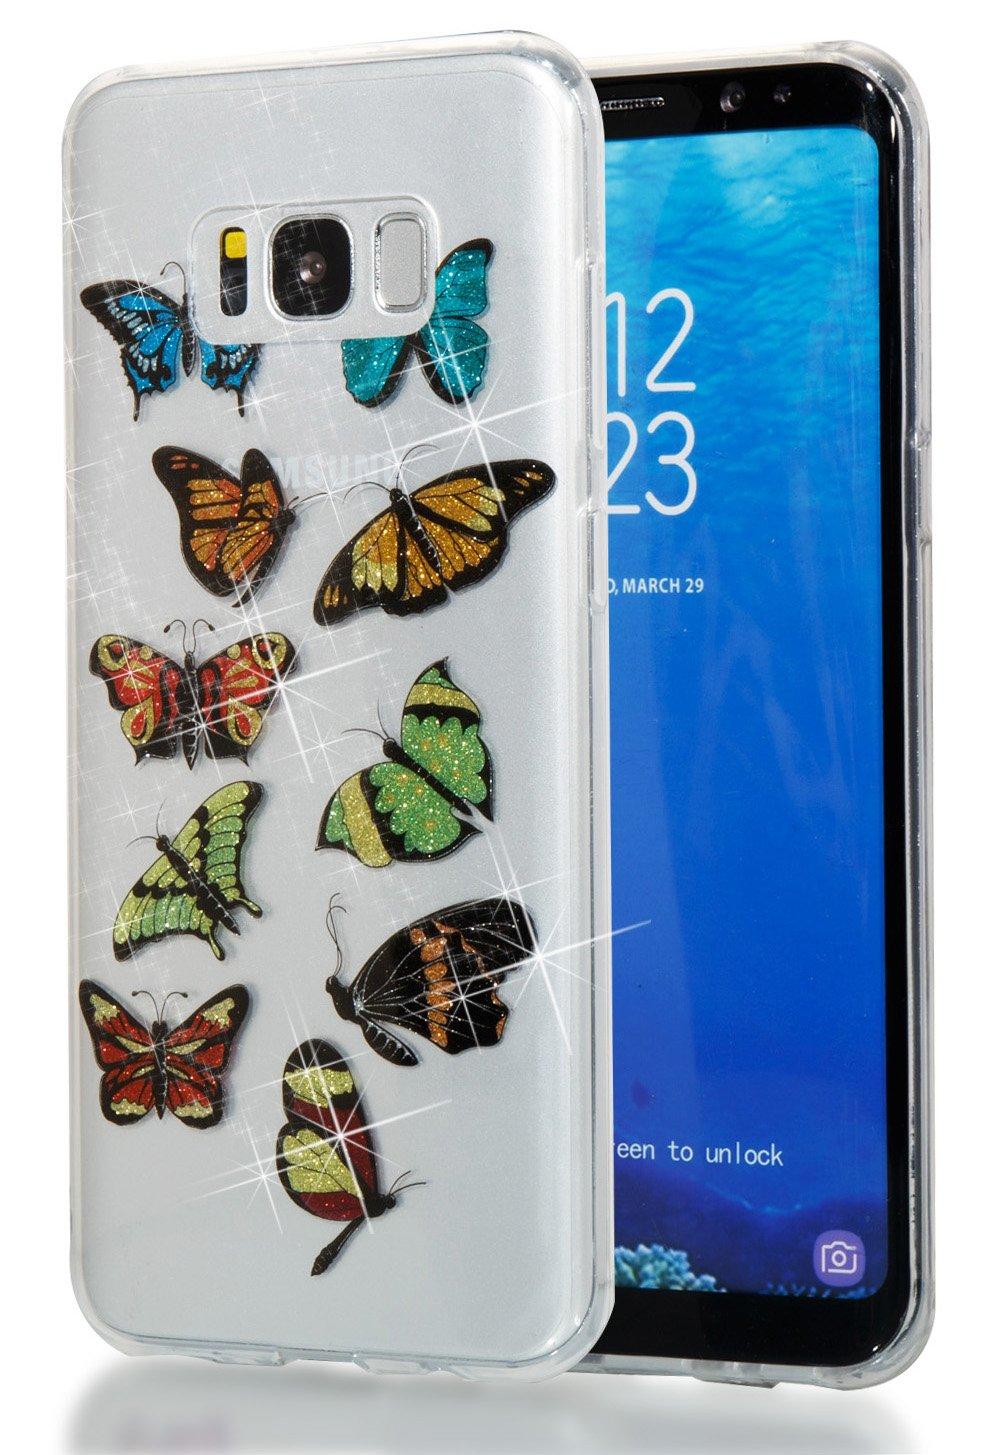 Galaxy S7 Case, Slim Soft TPU High Transparent Flash Powder MID Phone Cover  for SamsungS7 G9300 G930 G930F G930V G930A G930FD G930P Shock-Absorption